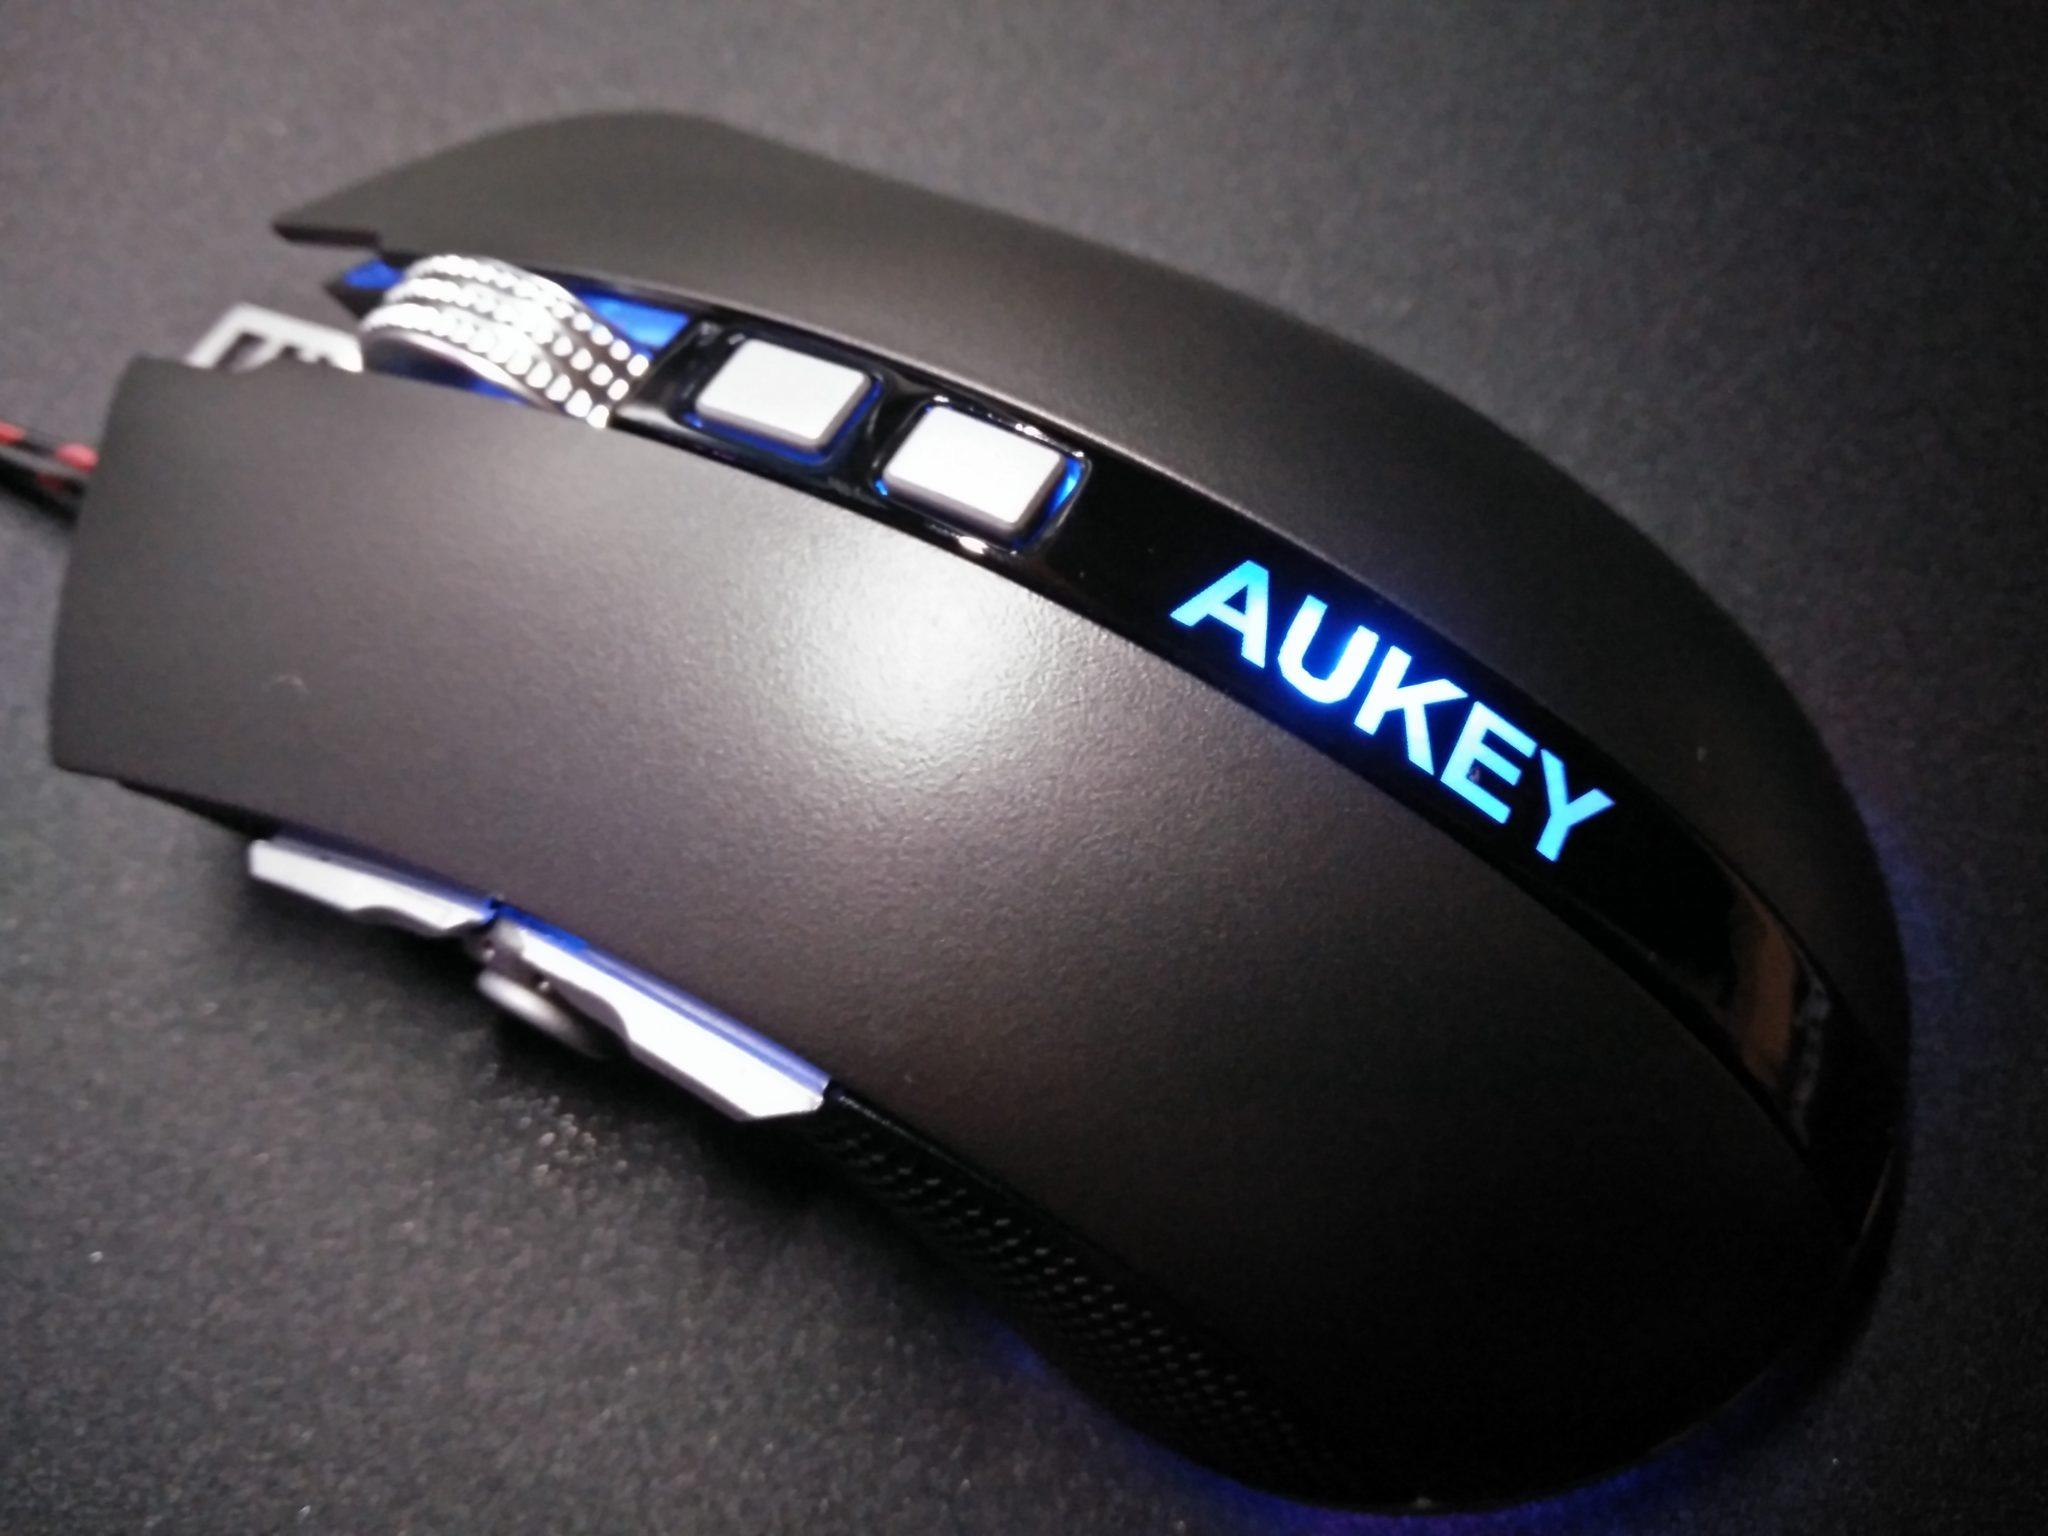 Getestet: AUKEY Gaming-Maus KM-C4